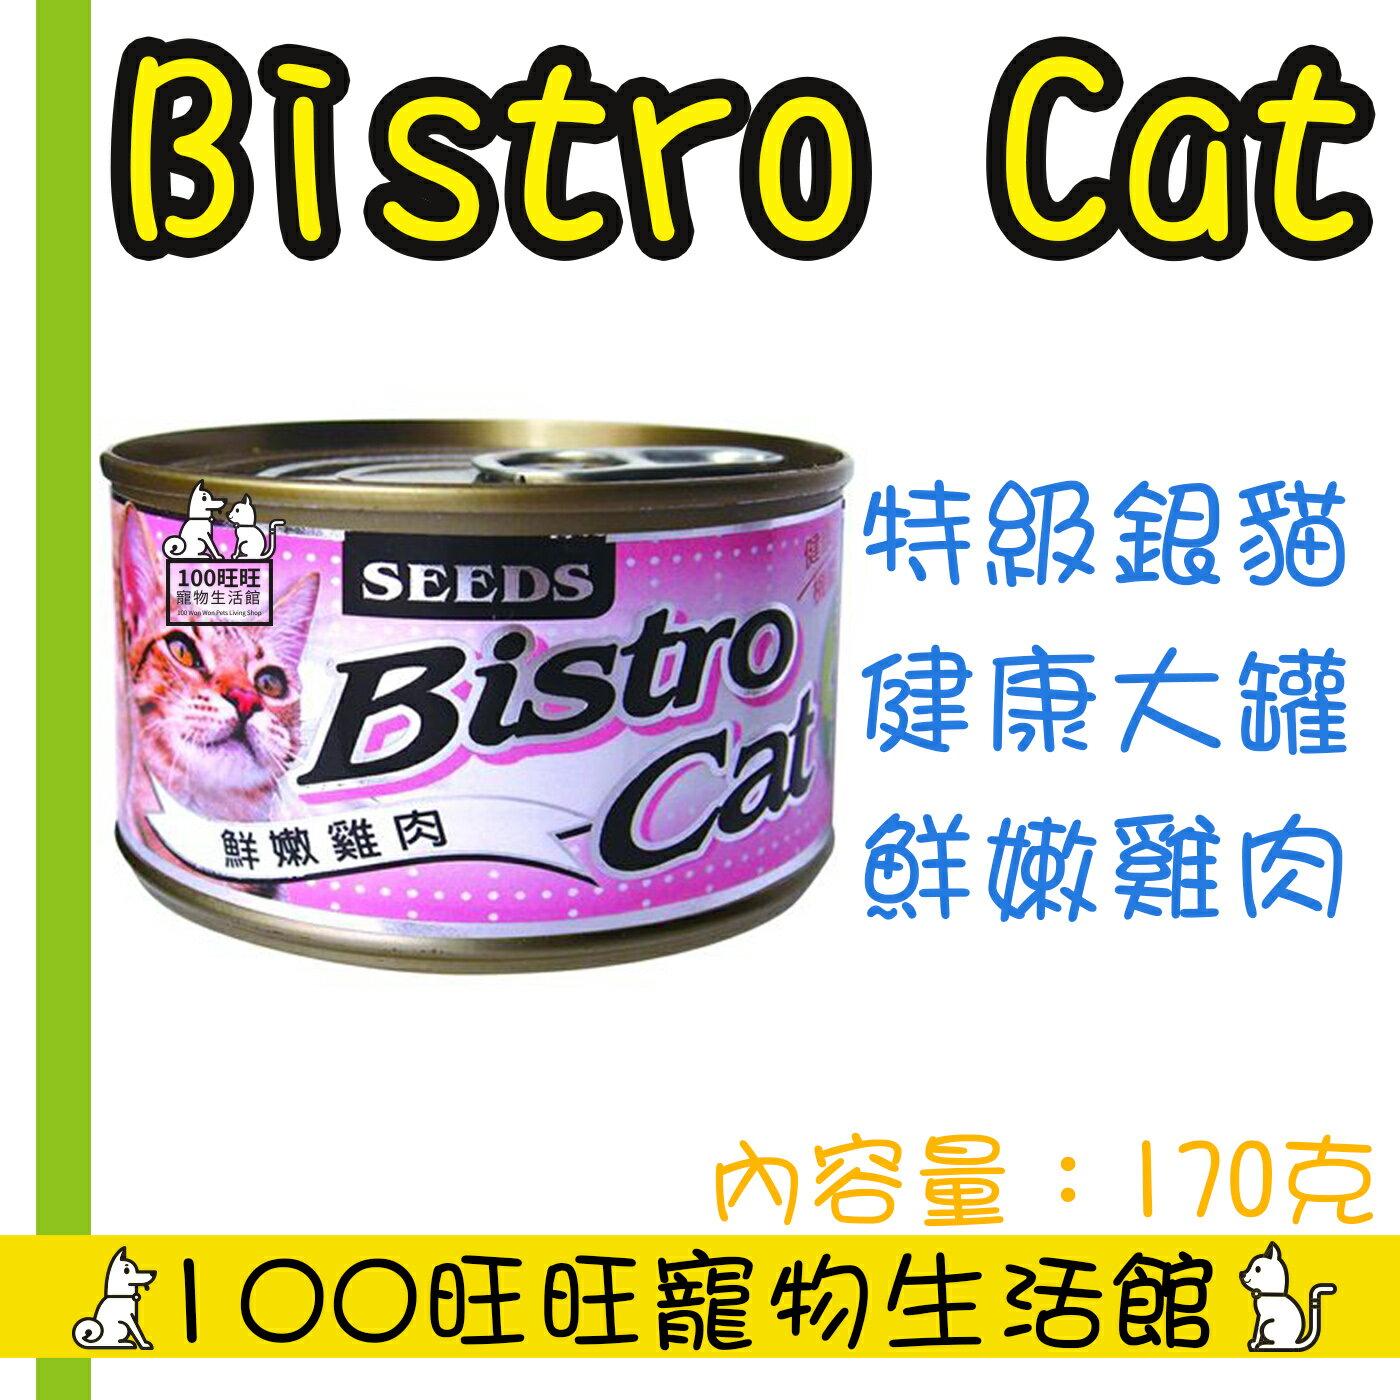 SEEDS 惜時 聖萊西 Bistro Cat 特級銀貓健康大罐 170g 銀罐 大銀 單罐